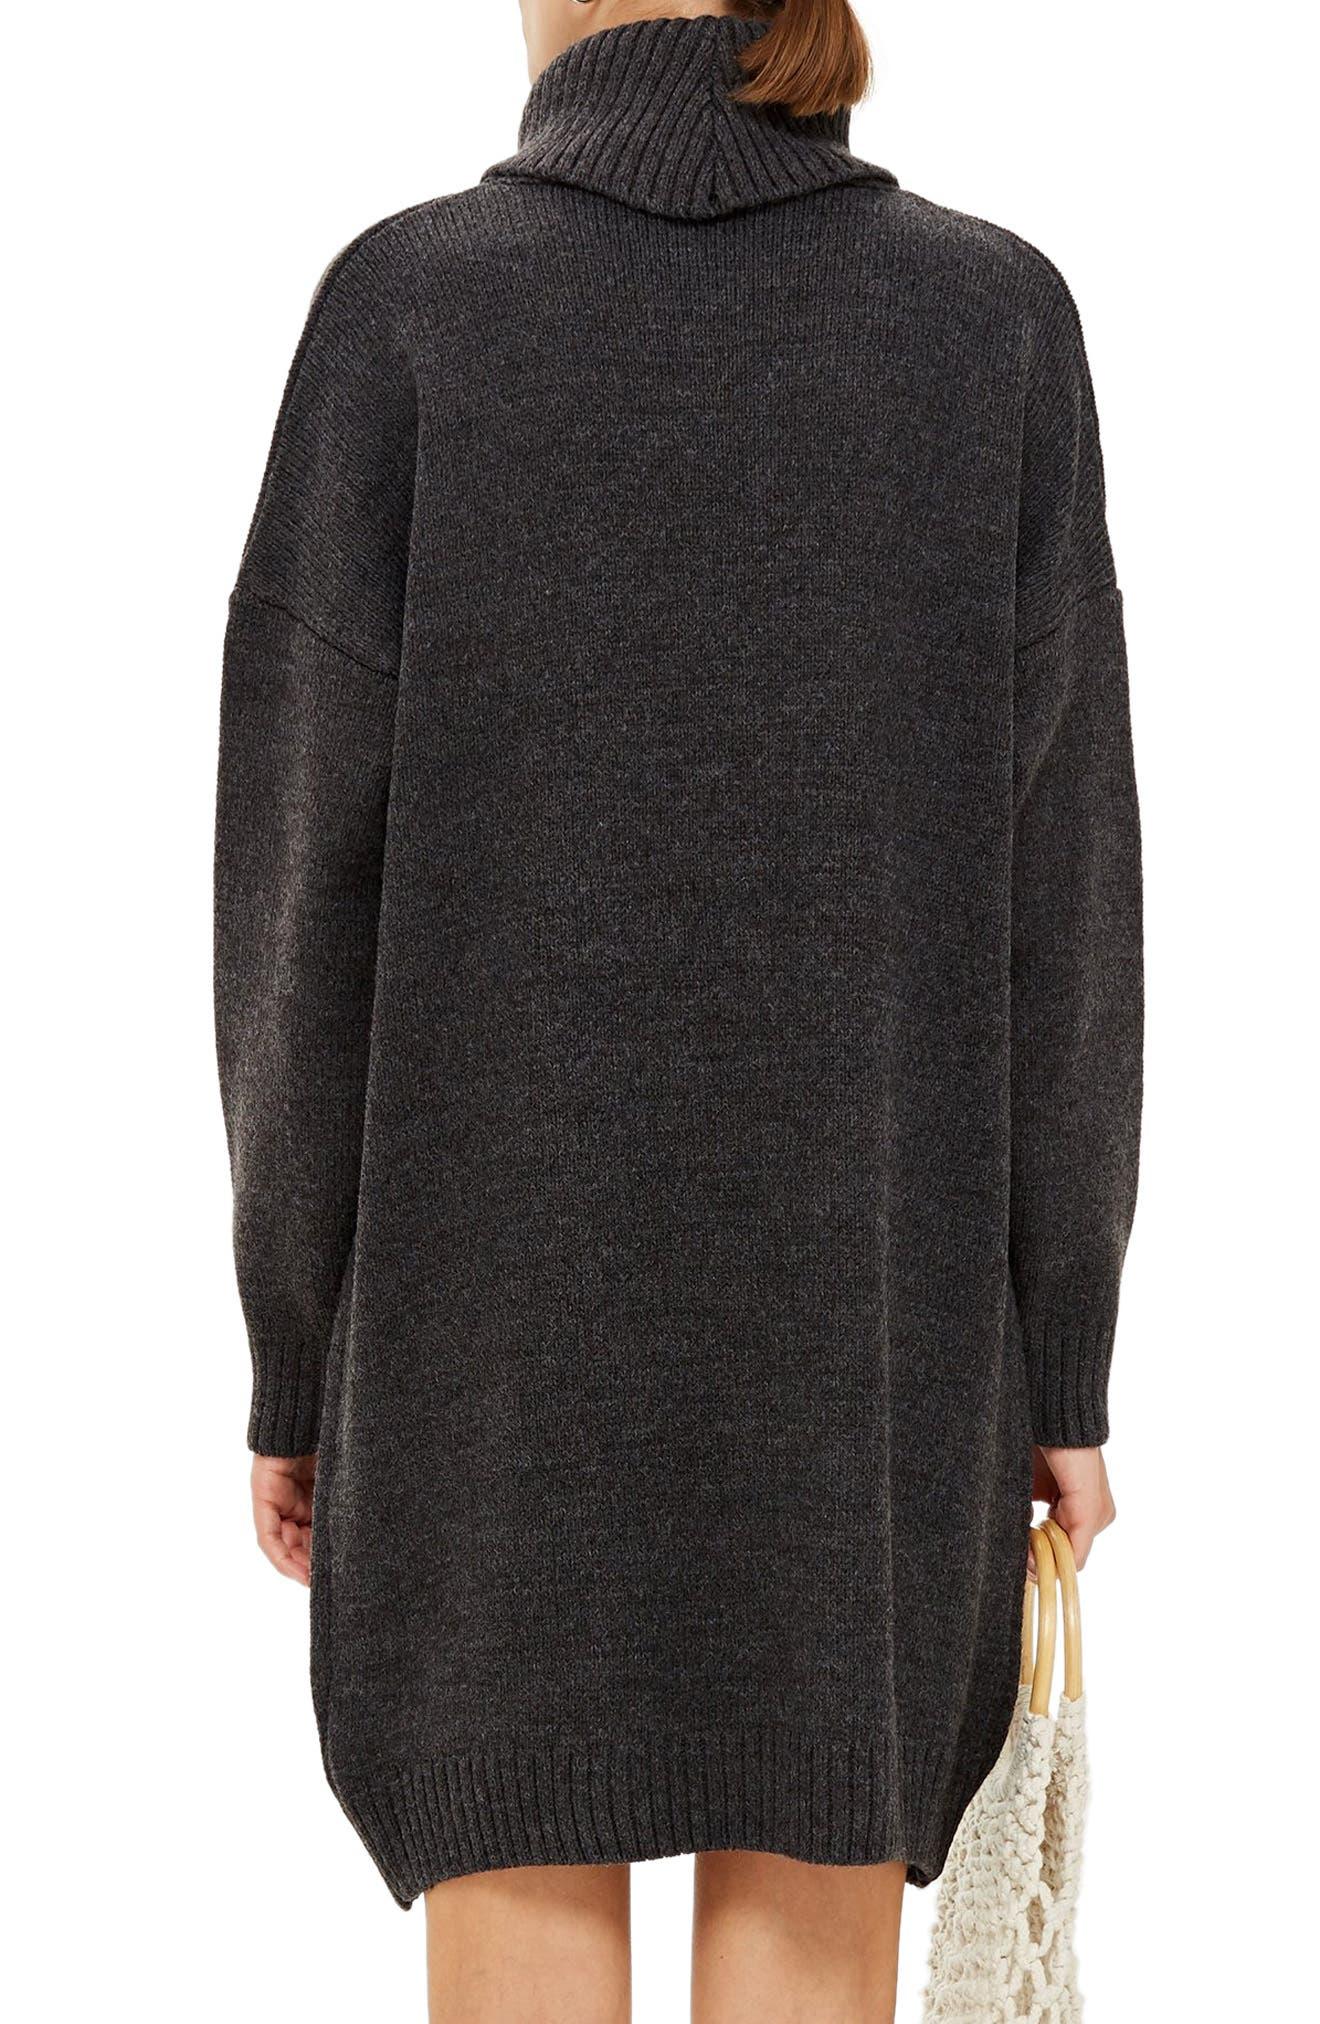 TOPSHOP, Turtleneck Sweater Dress, Alternate thumbnail 2, color, 021